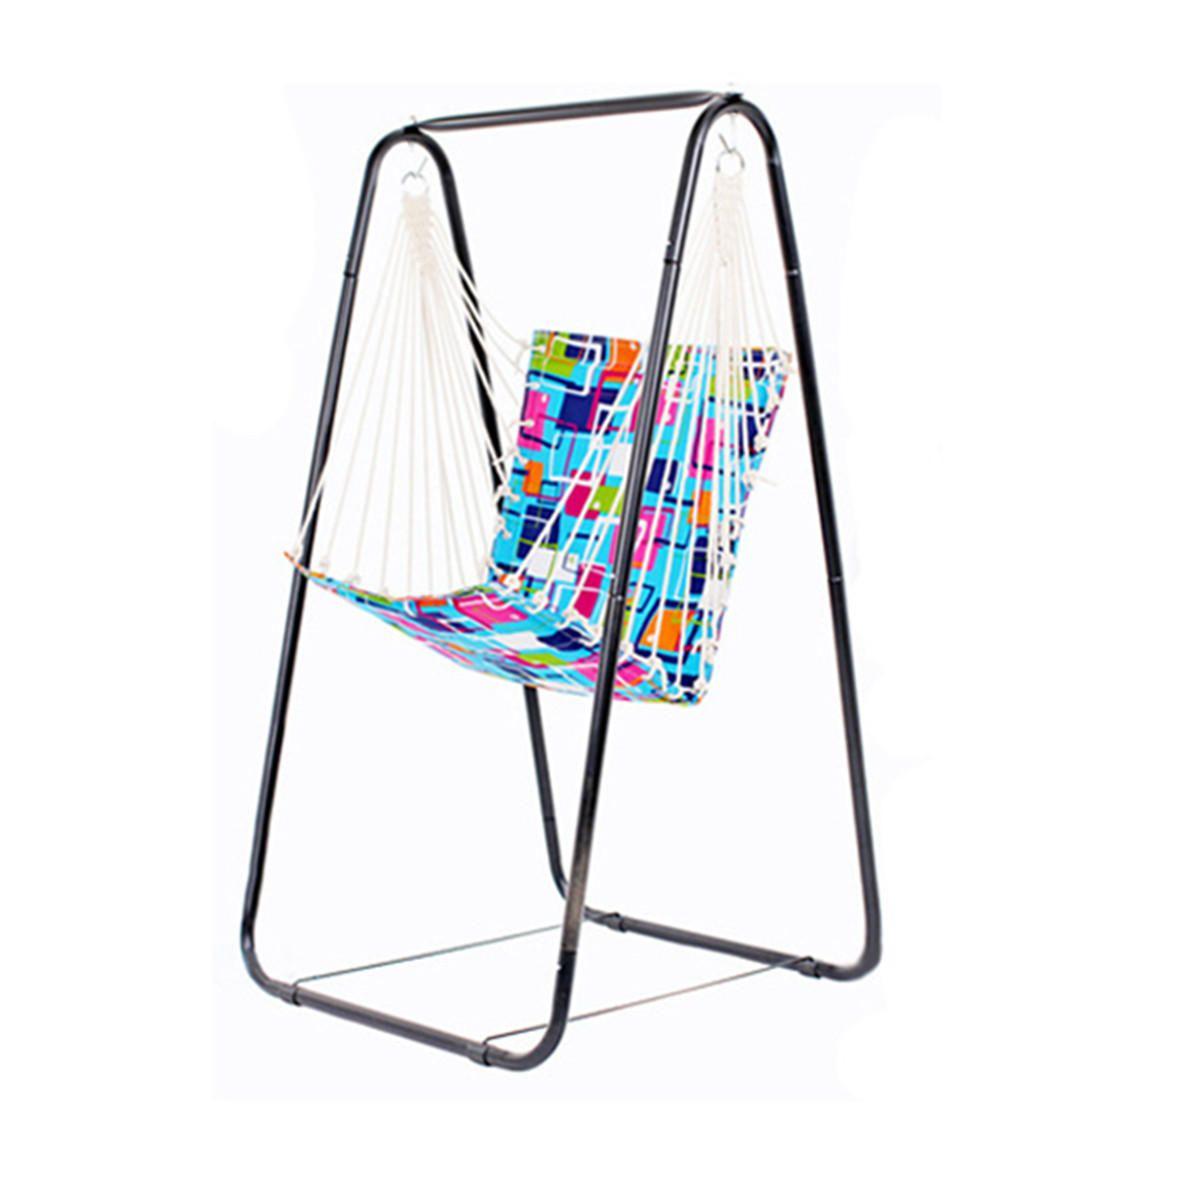 Hammock Hanging Chair Leisure Swing + Steel Foot Holder Garden Outdoor  Camping Hammock Swing Chair For Rest Outdoor Deck Furniture Patio Garden  Furniture ...